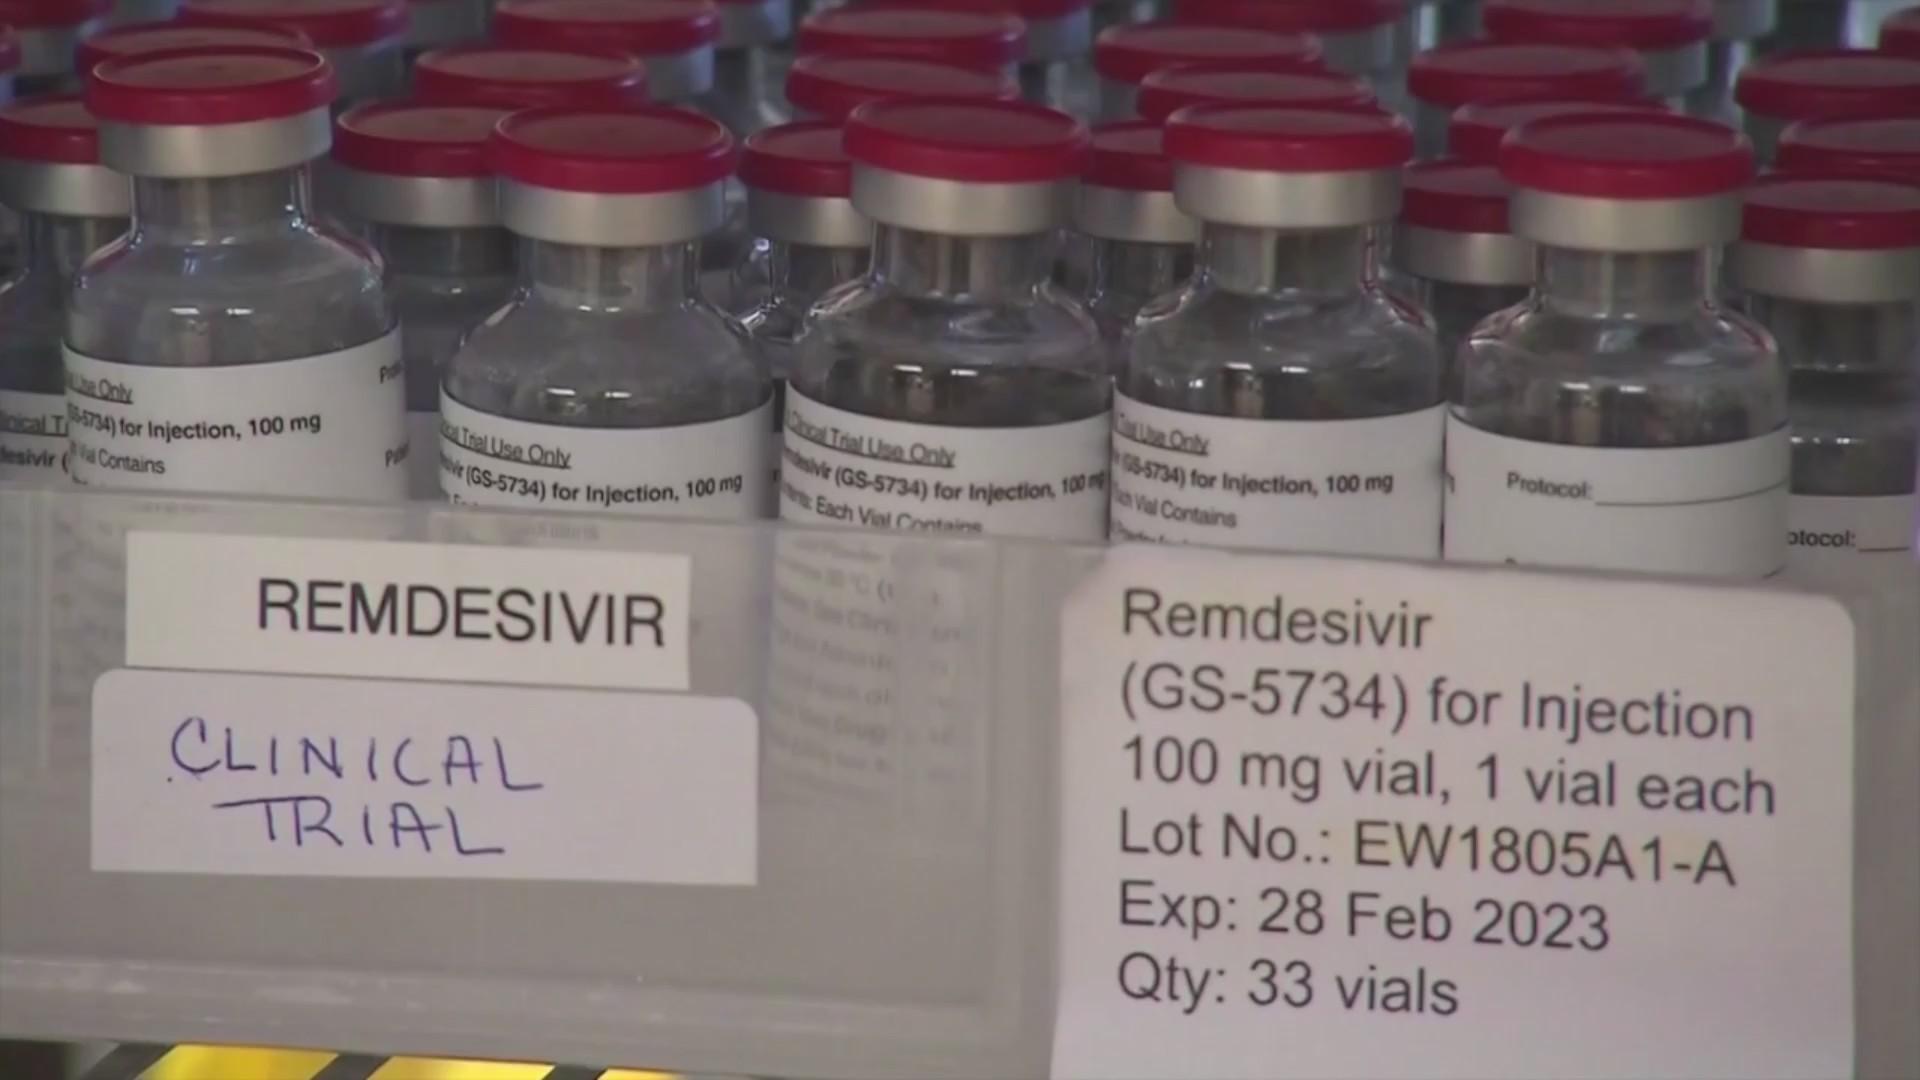 Remdesivir COVID-19 trials